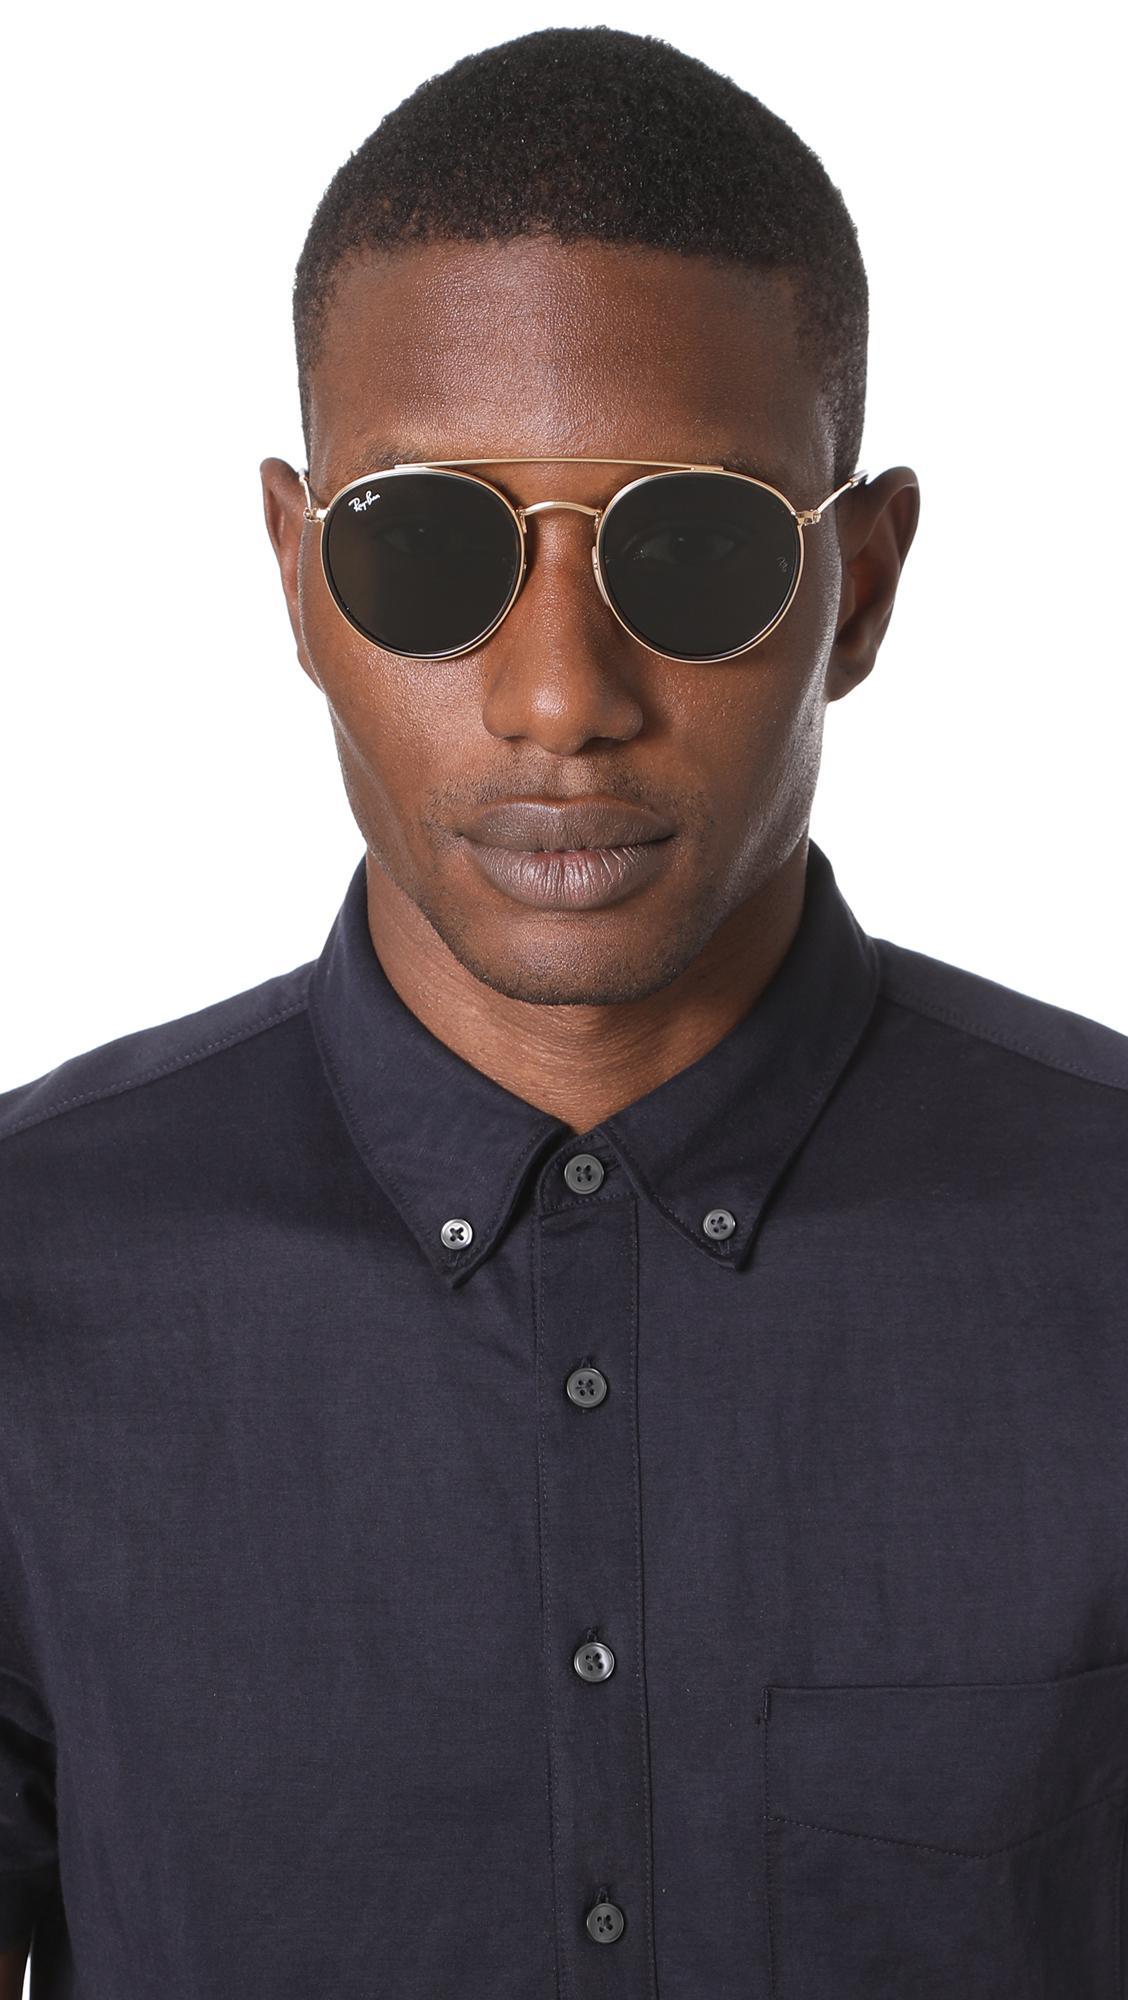 b77f727cc3 Lyst - Ray-Ban Double Bridge Round Sunglasses in Green for Men